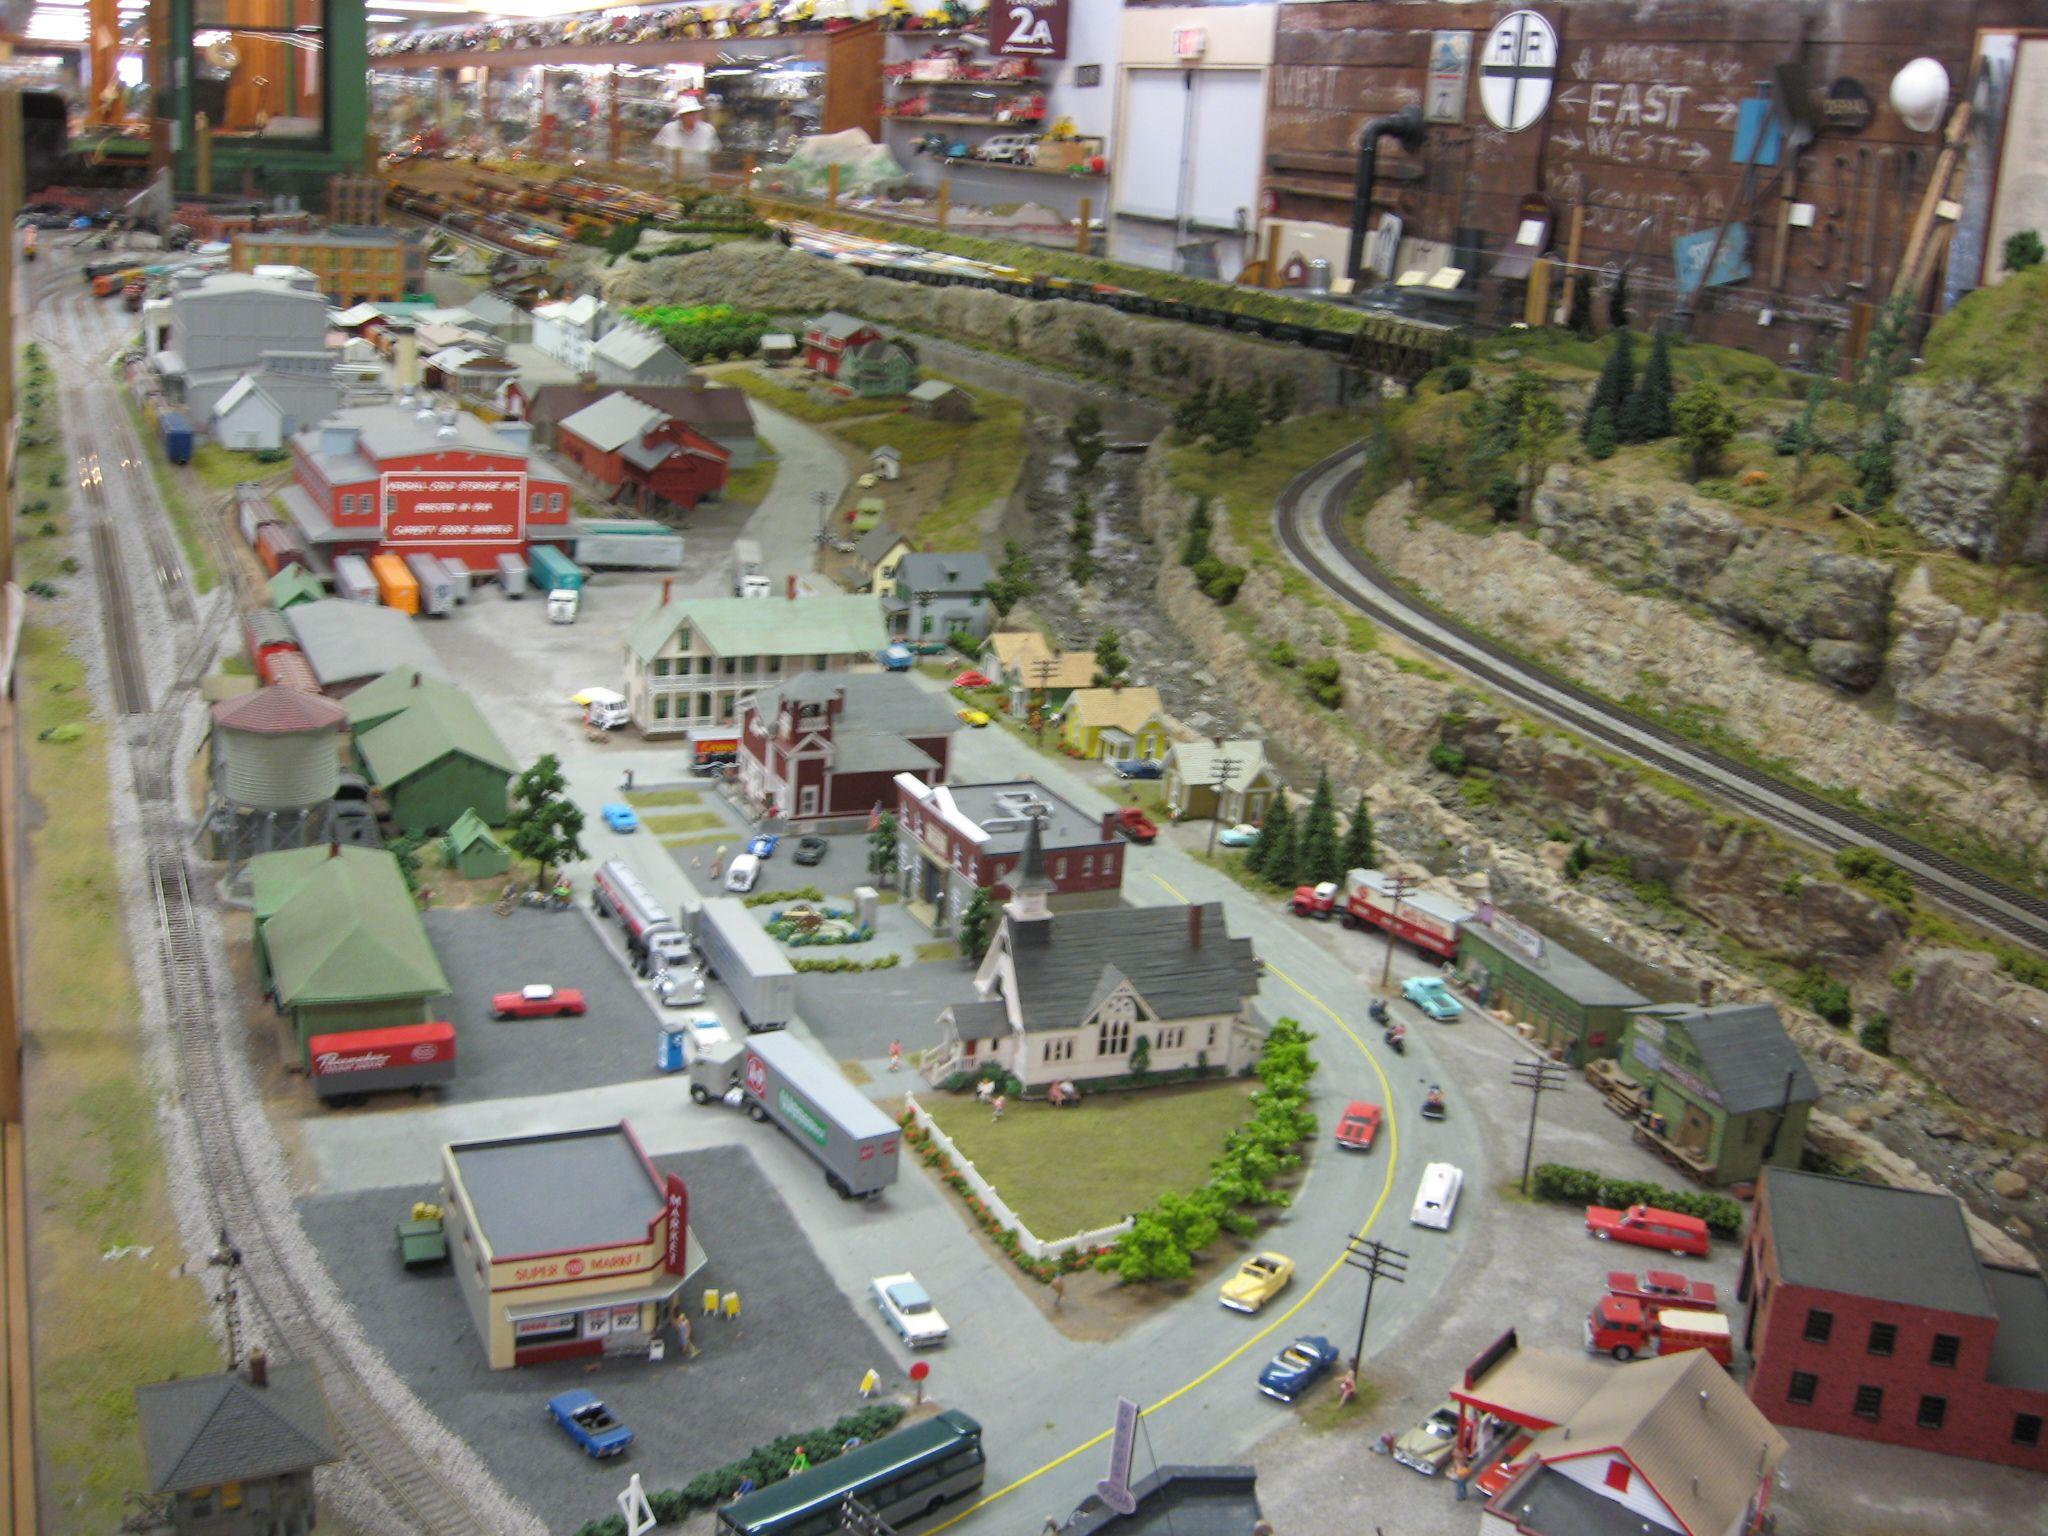 medina railroad museum ho scale model train layout 23 model